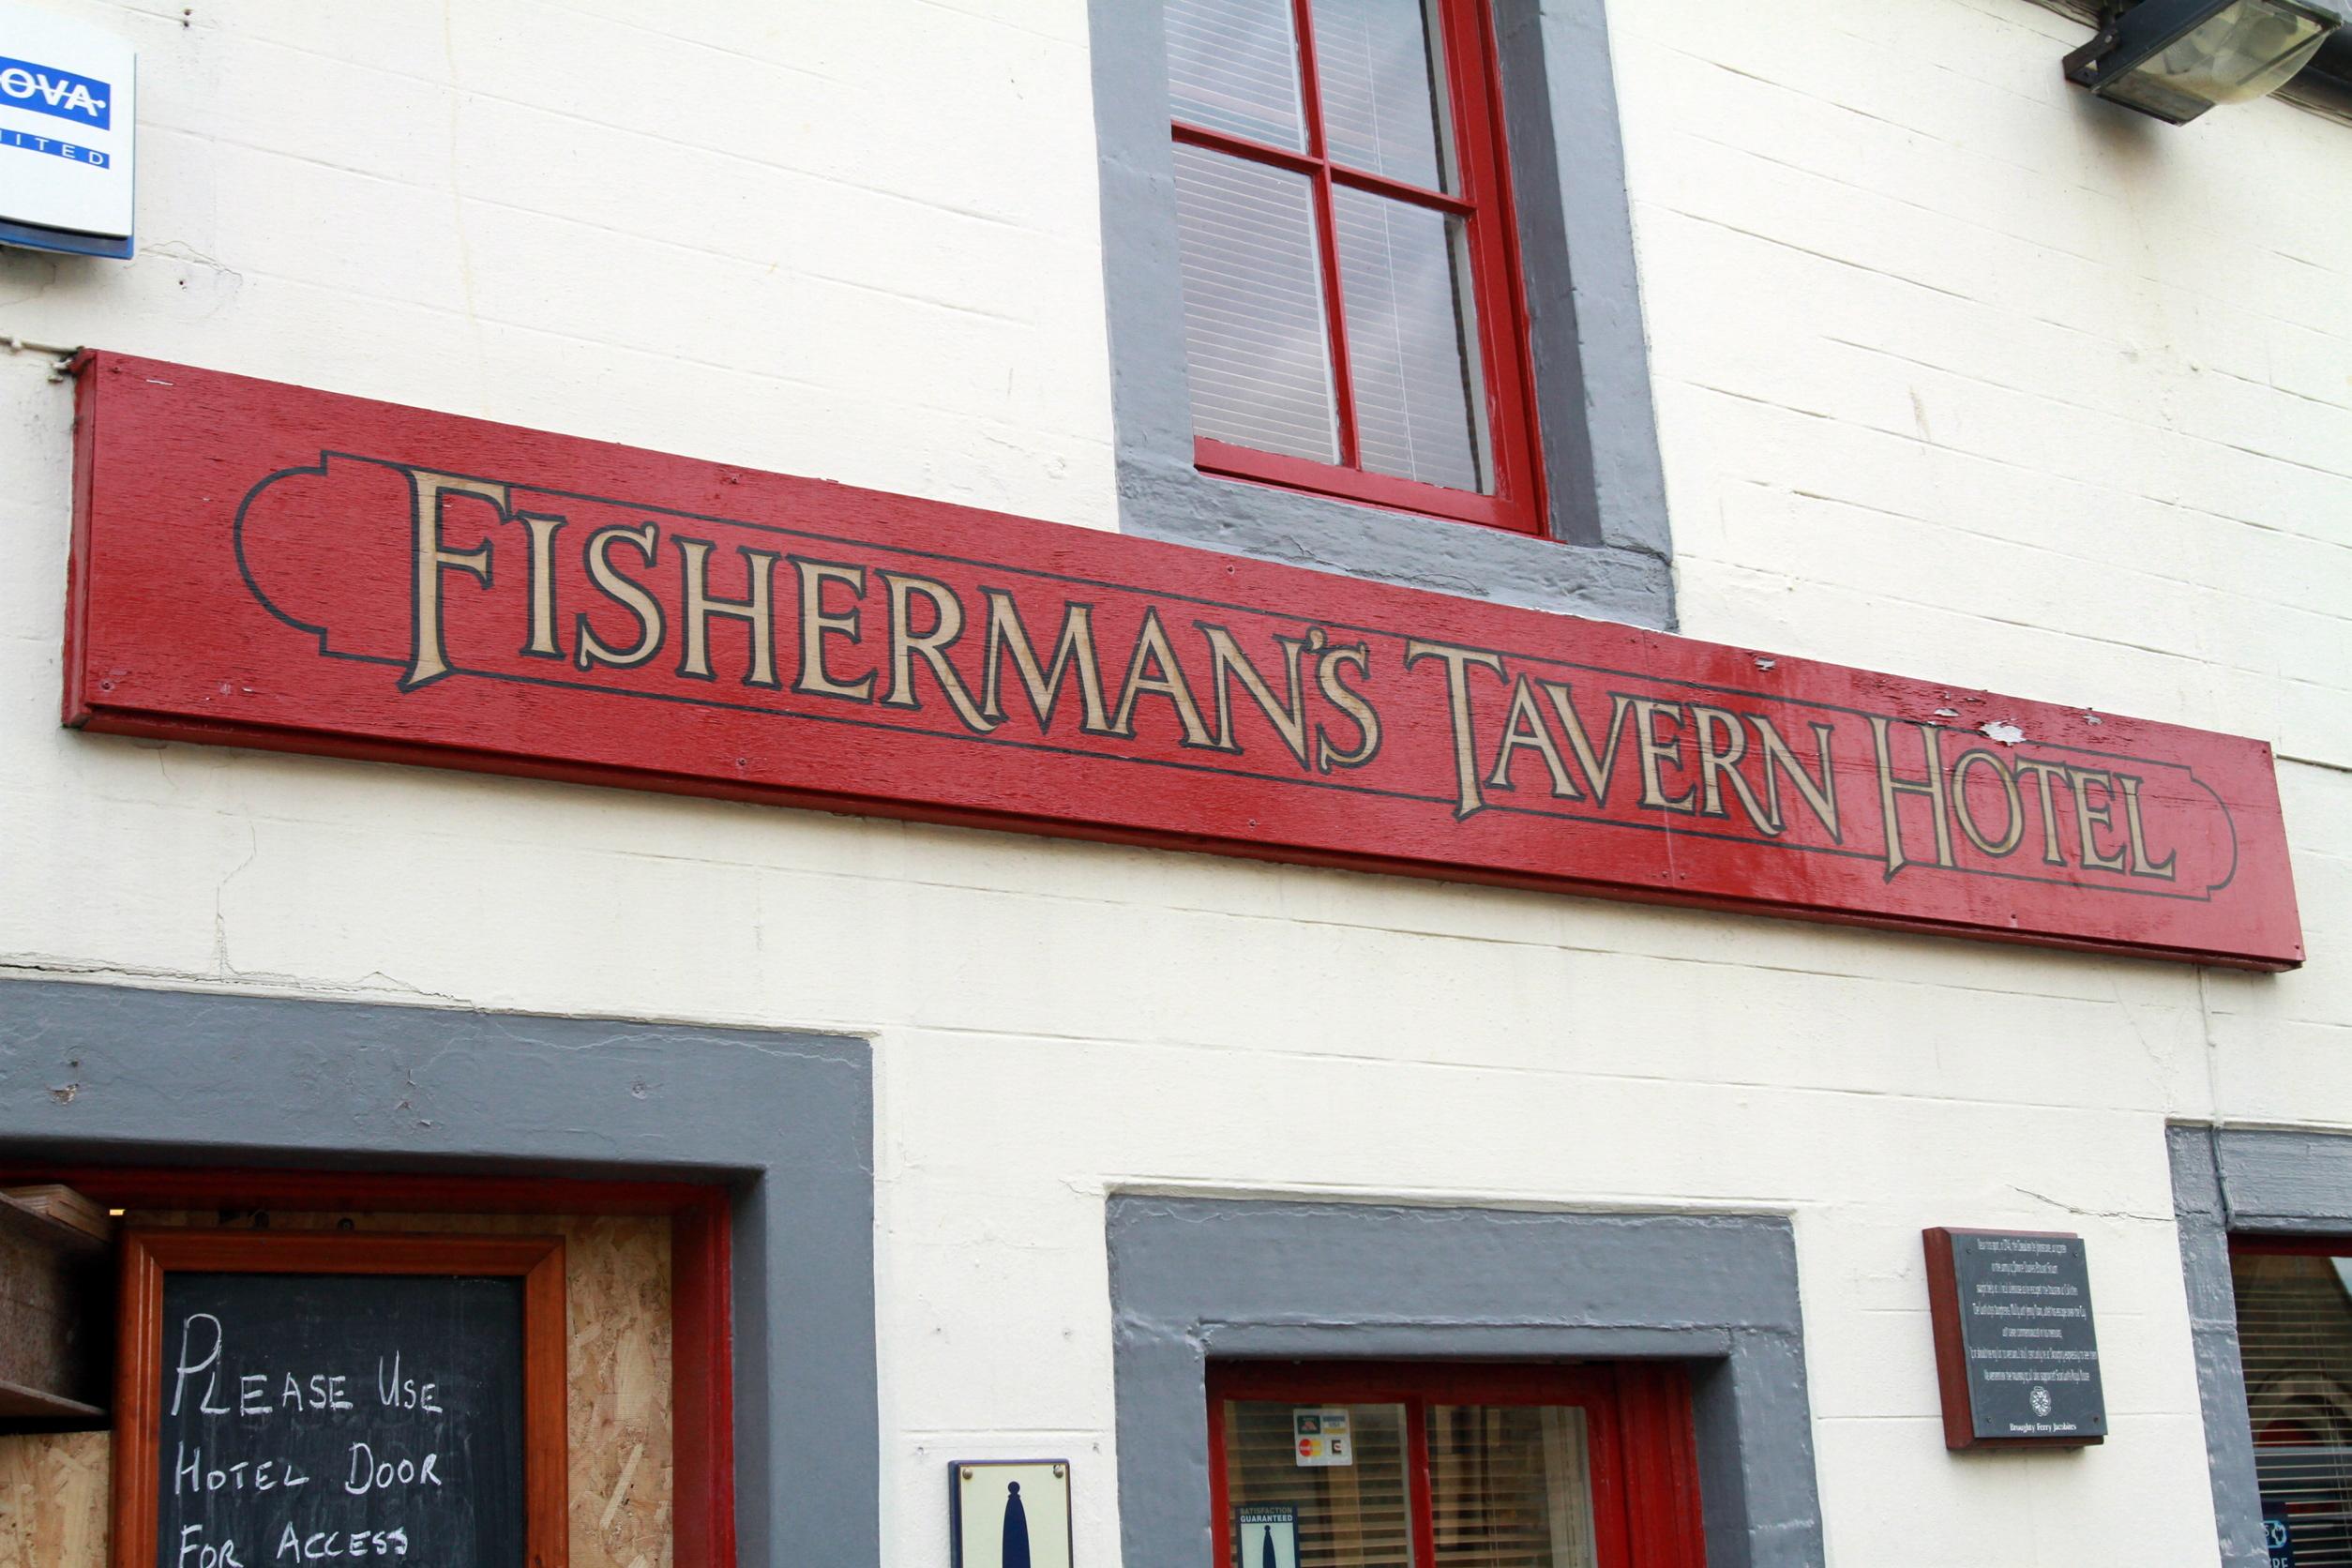 The Fisherman's Tavern